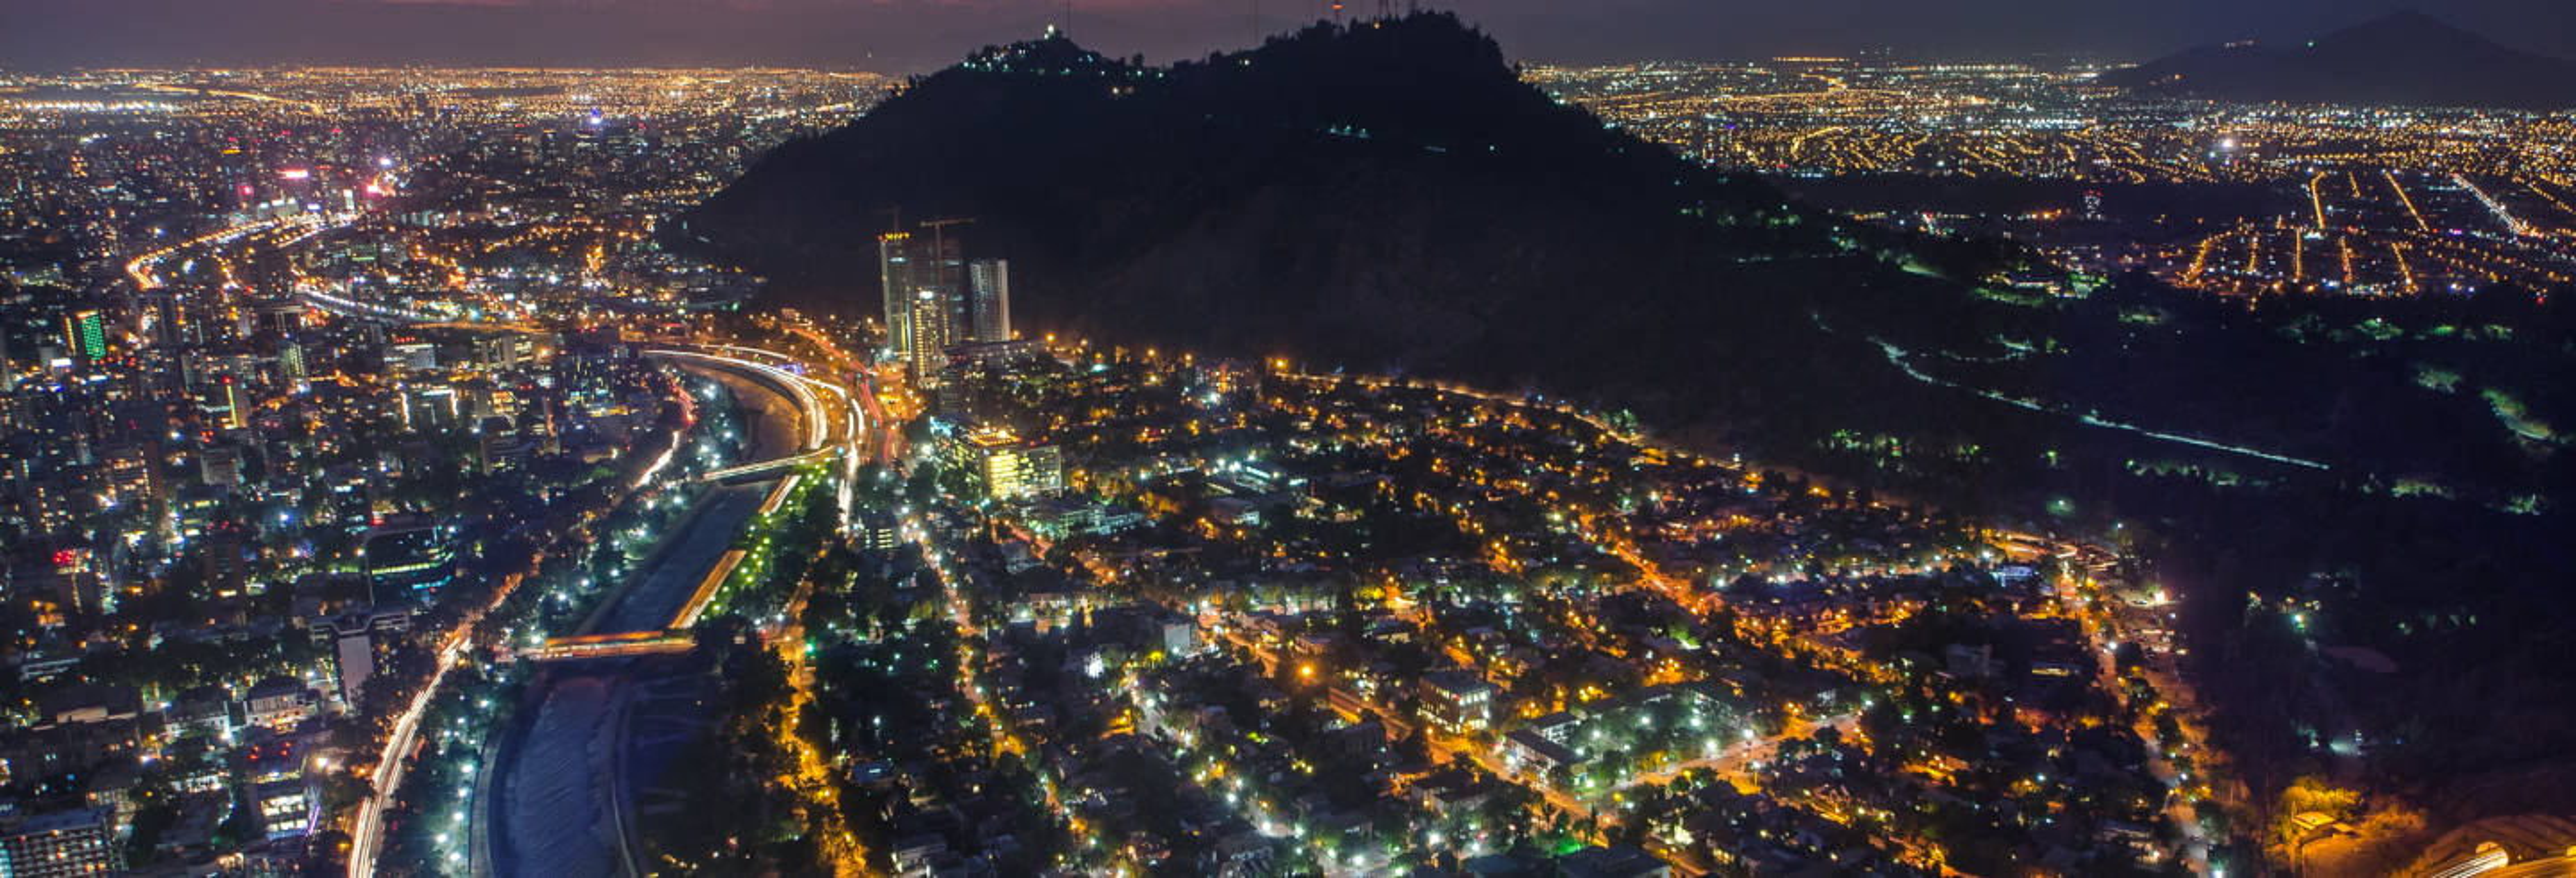 Alternative Night Tour of Santiago